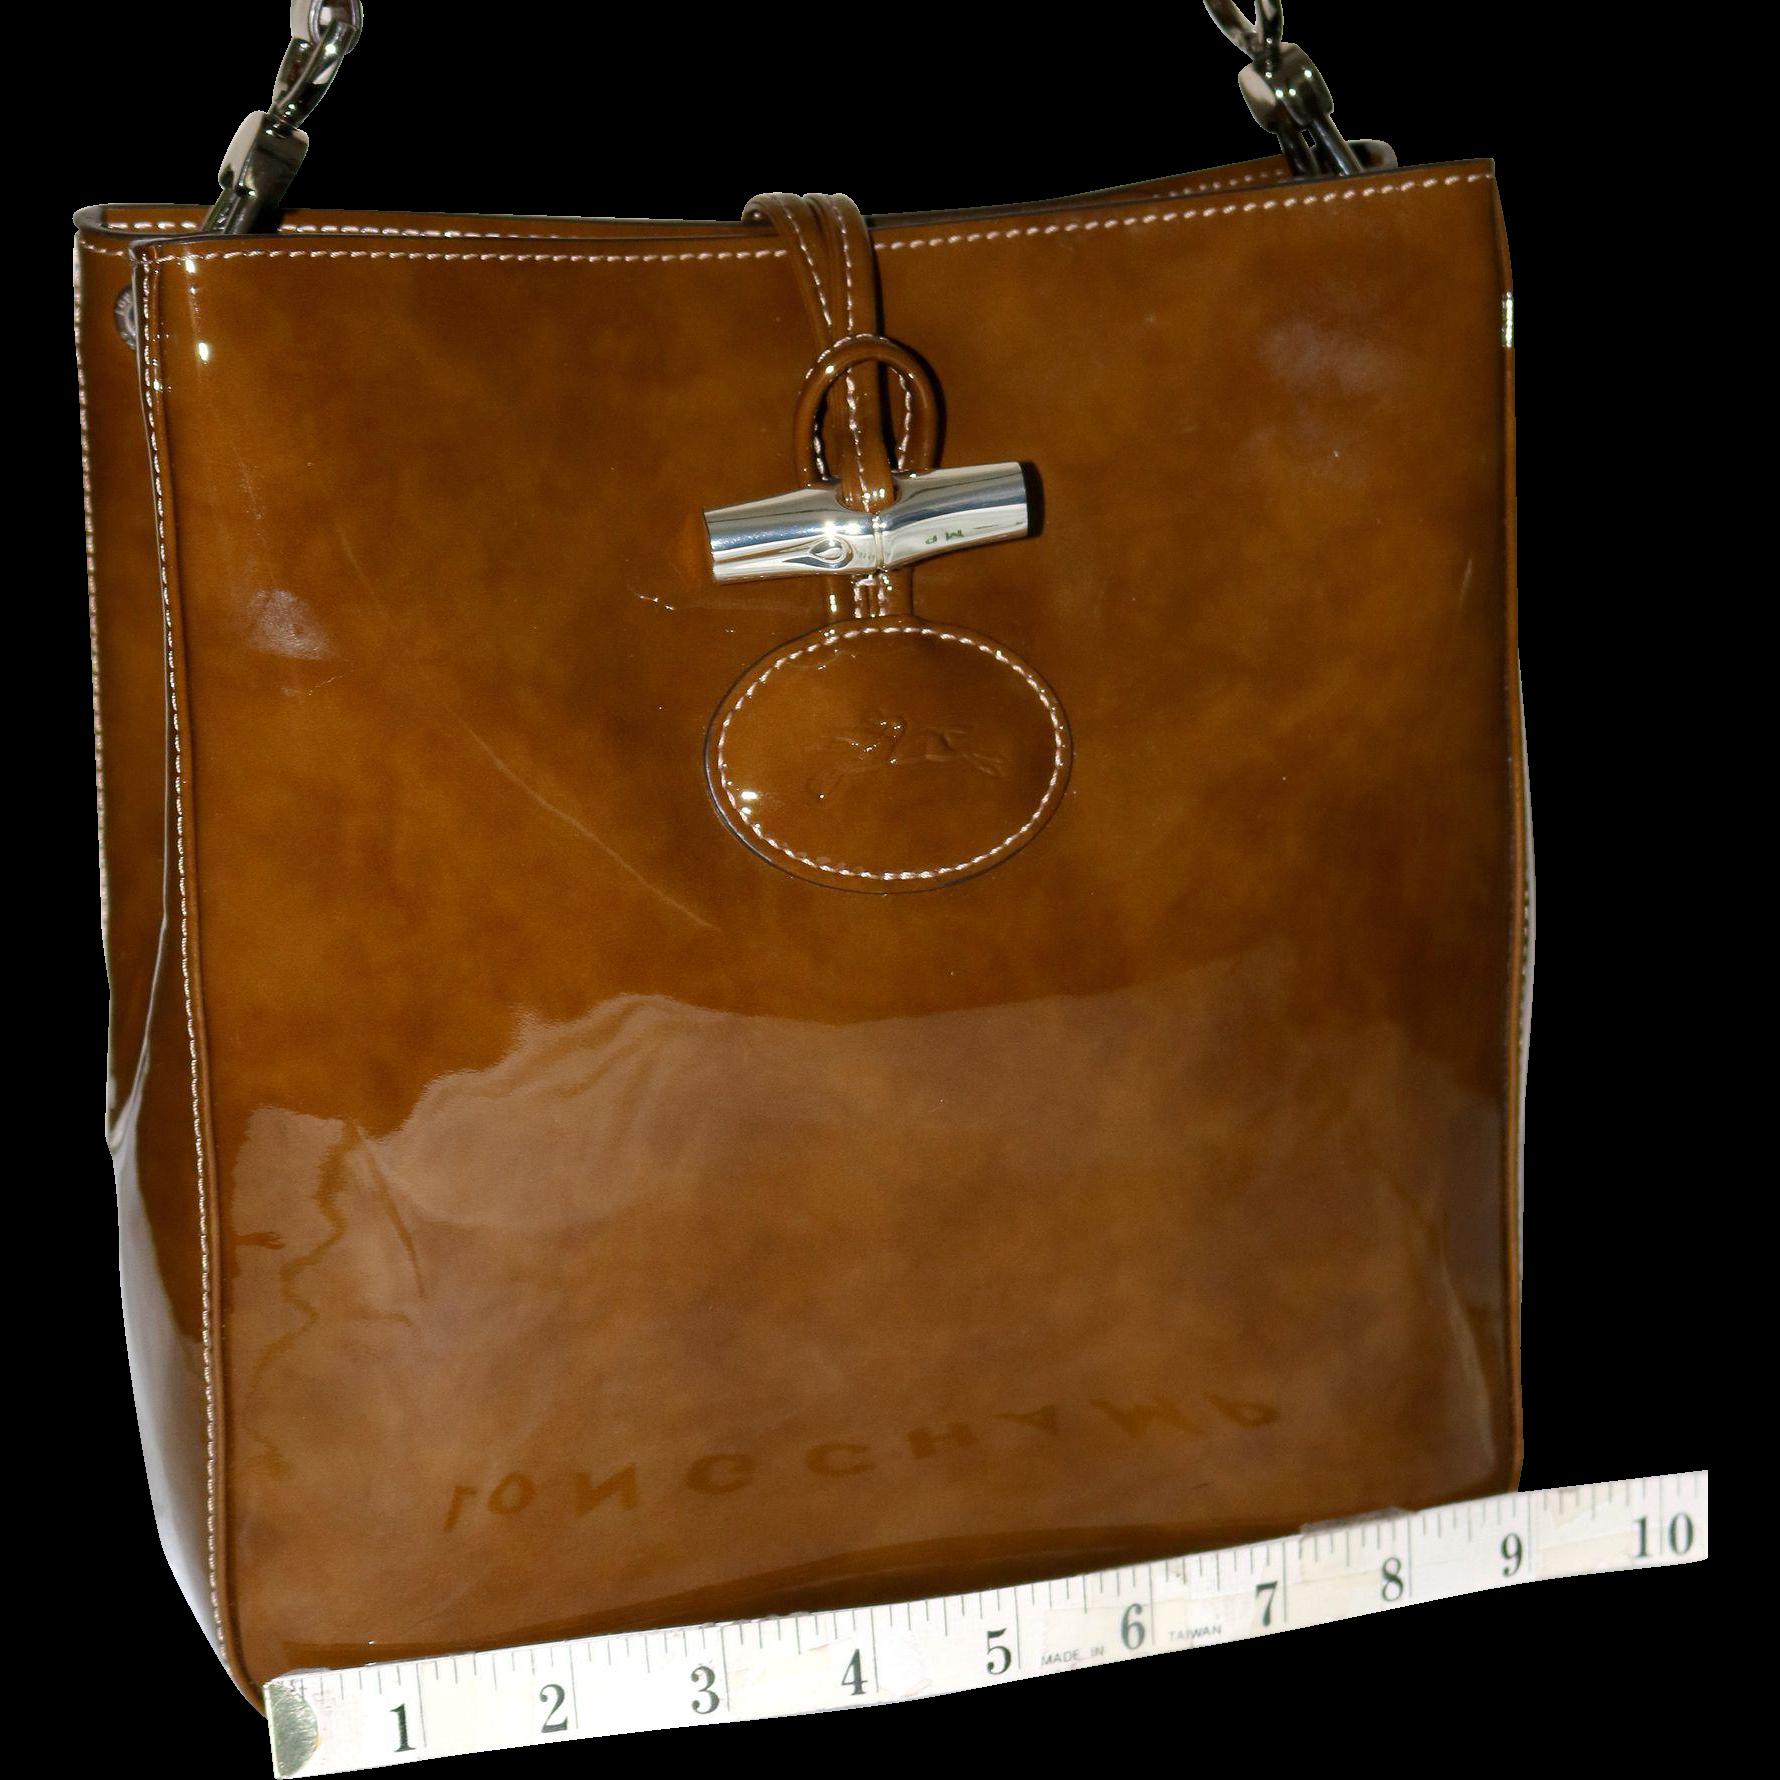 Vintage Longchamp Roseau Box Tote